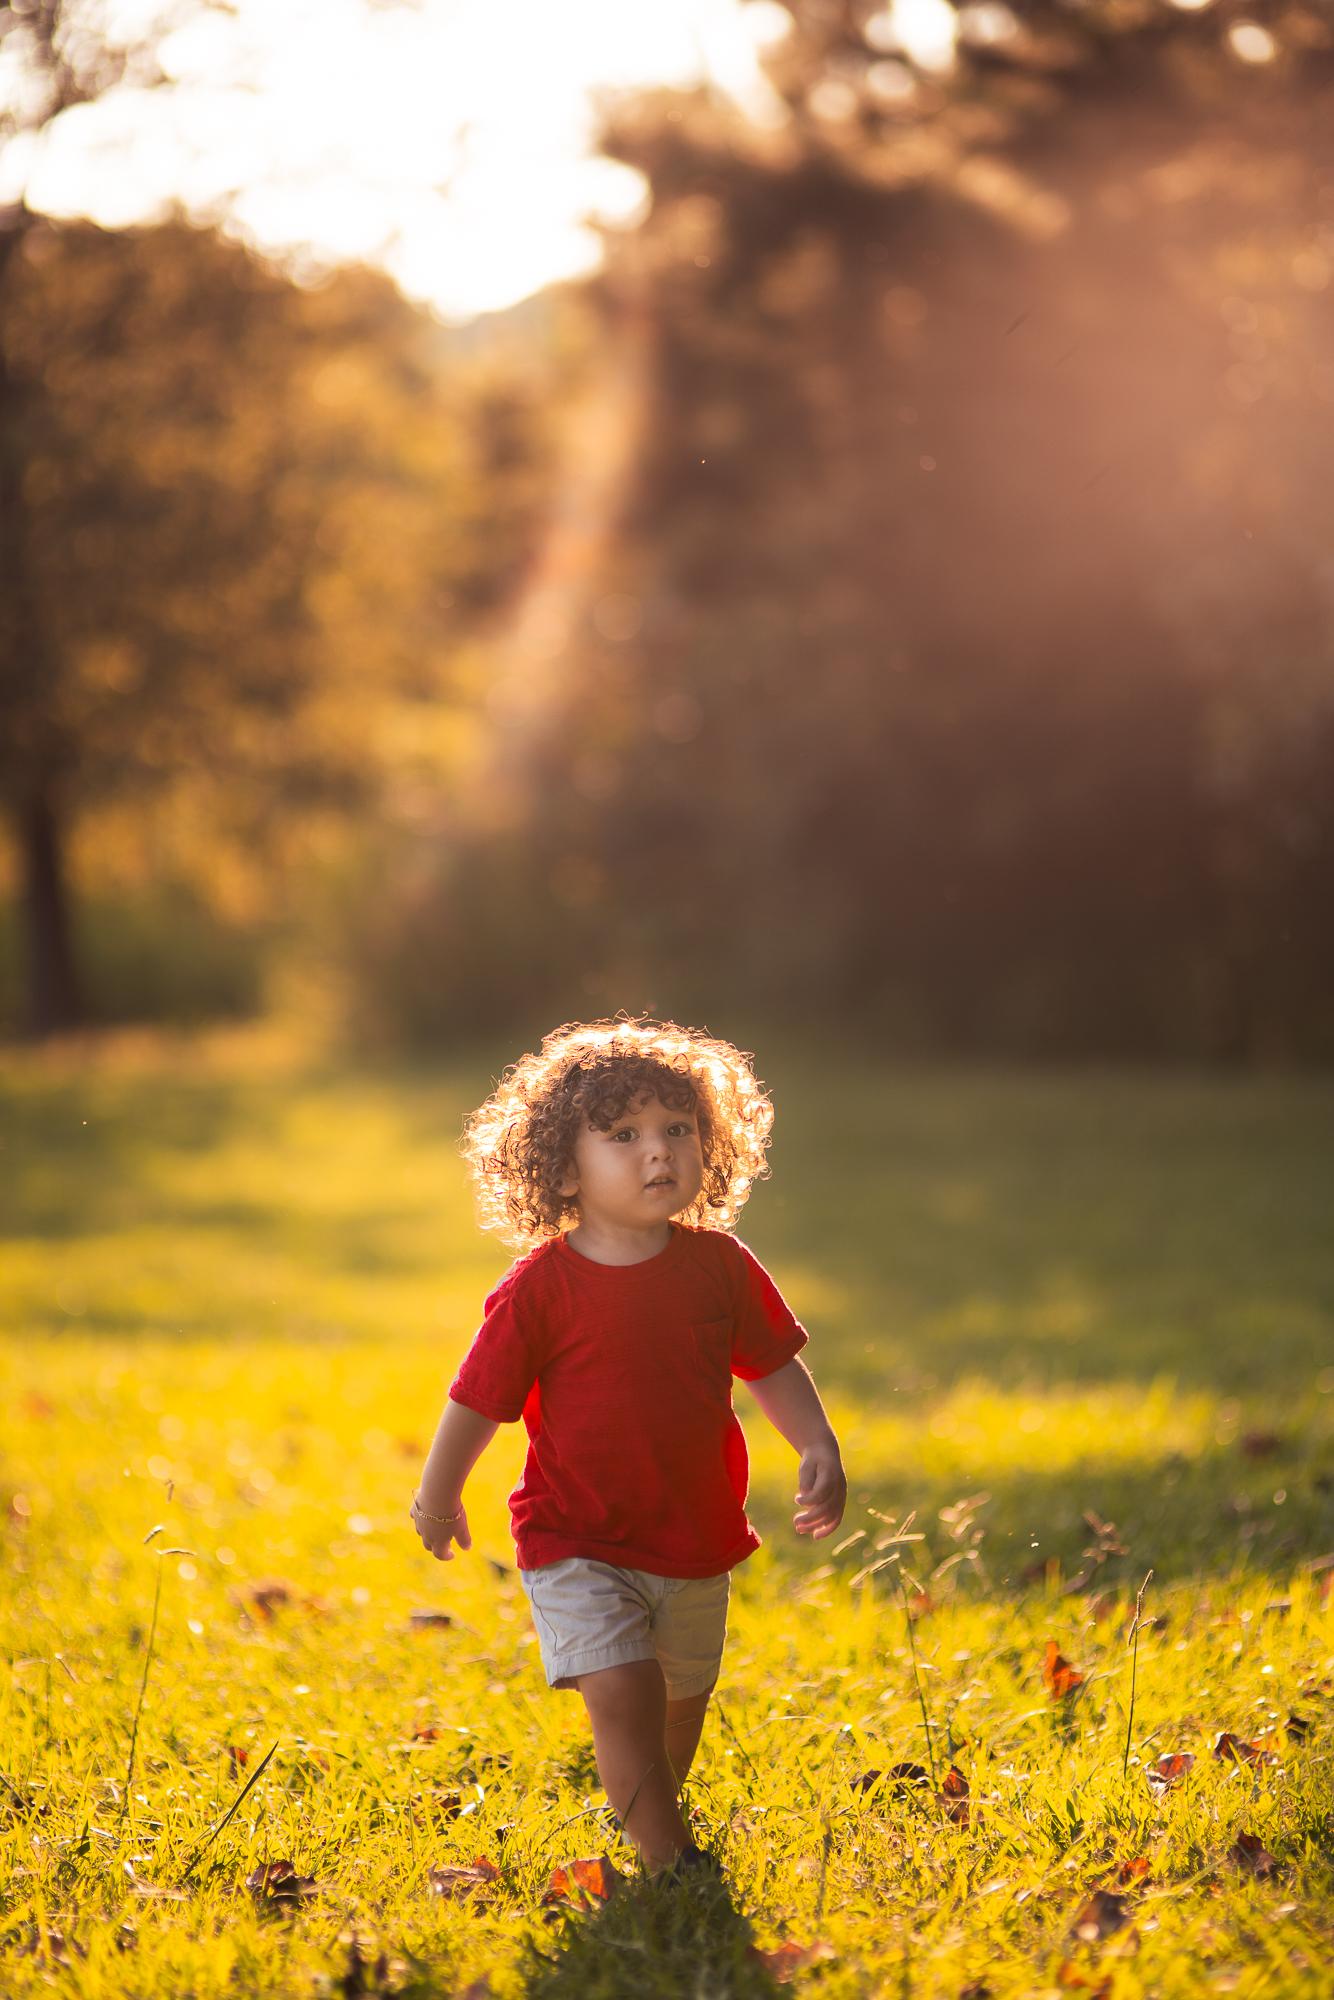 Atlanta/Gwinnett/Lawrenceville kids photography